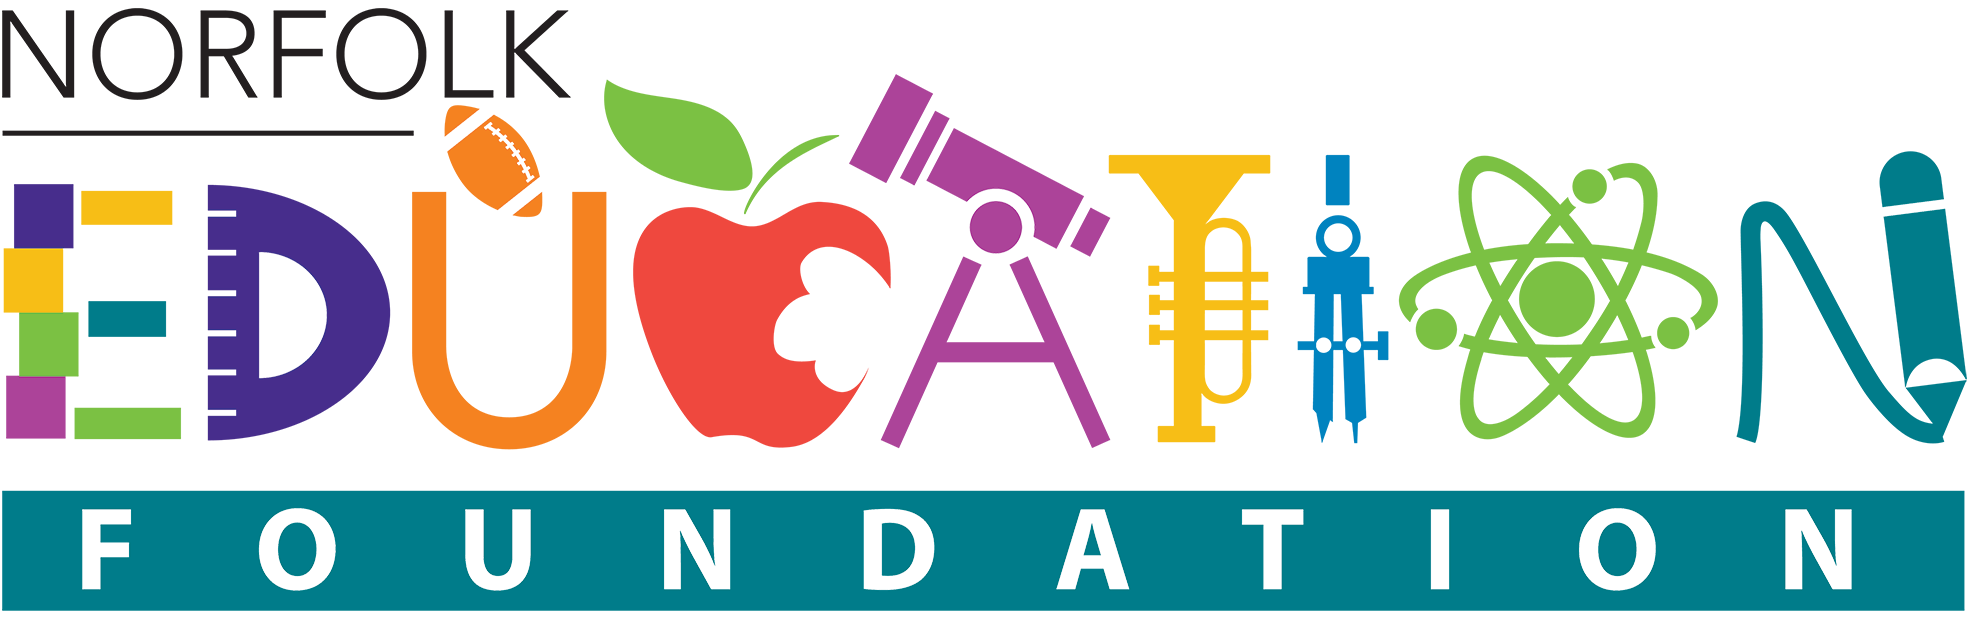 Norfolk education foundation donate. Donation clipart school funding